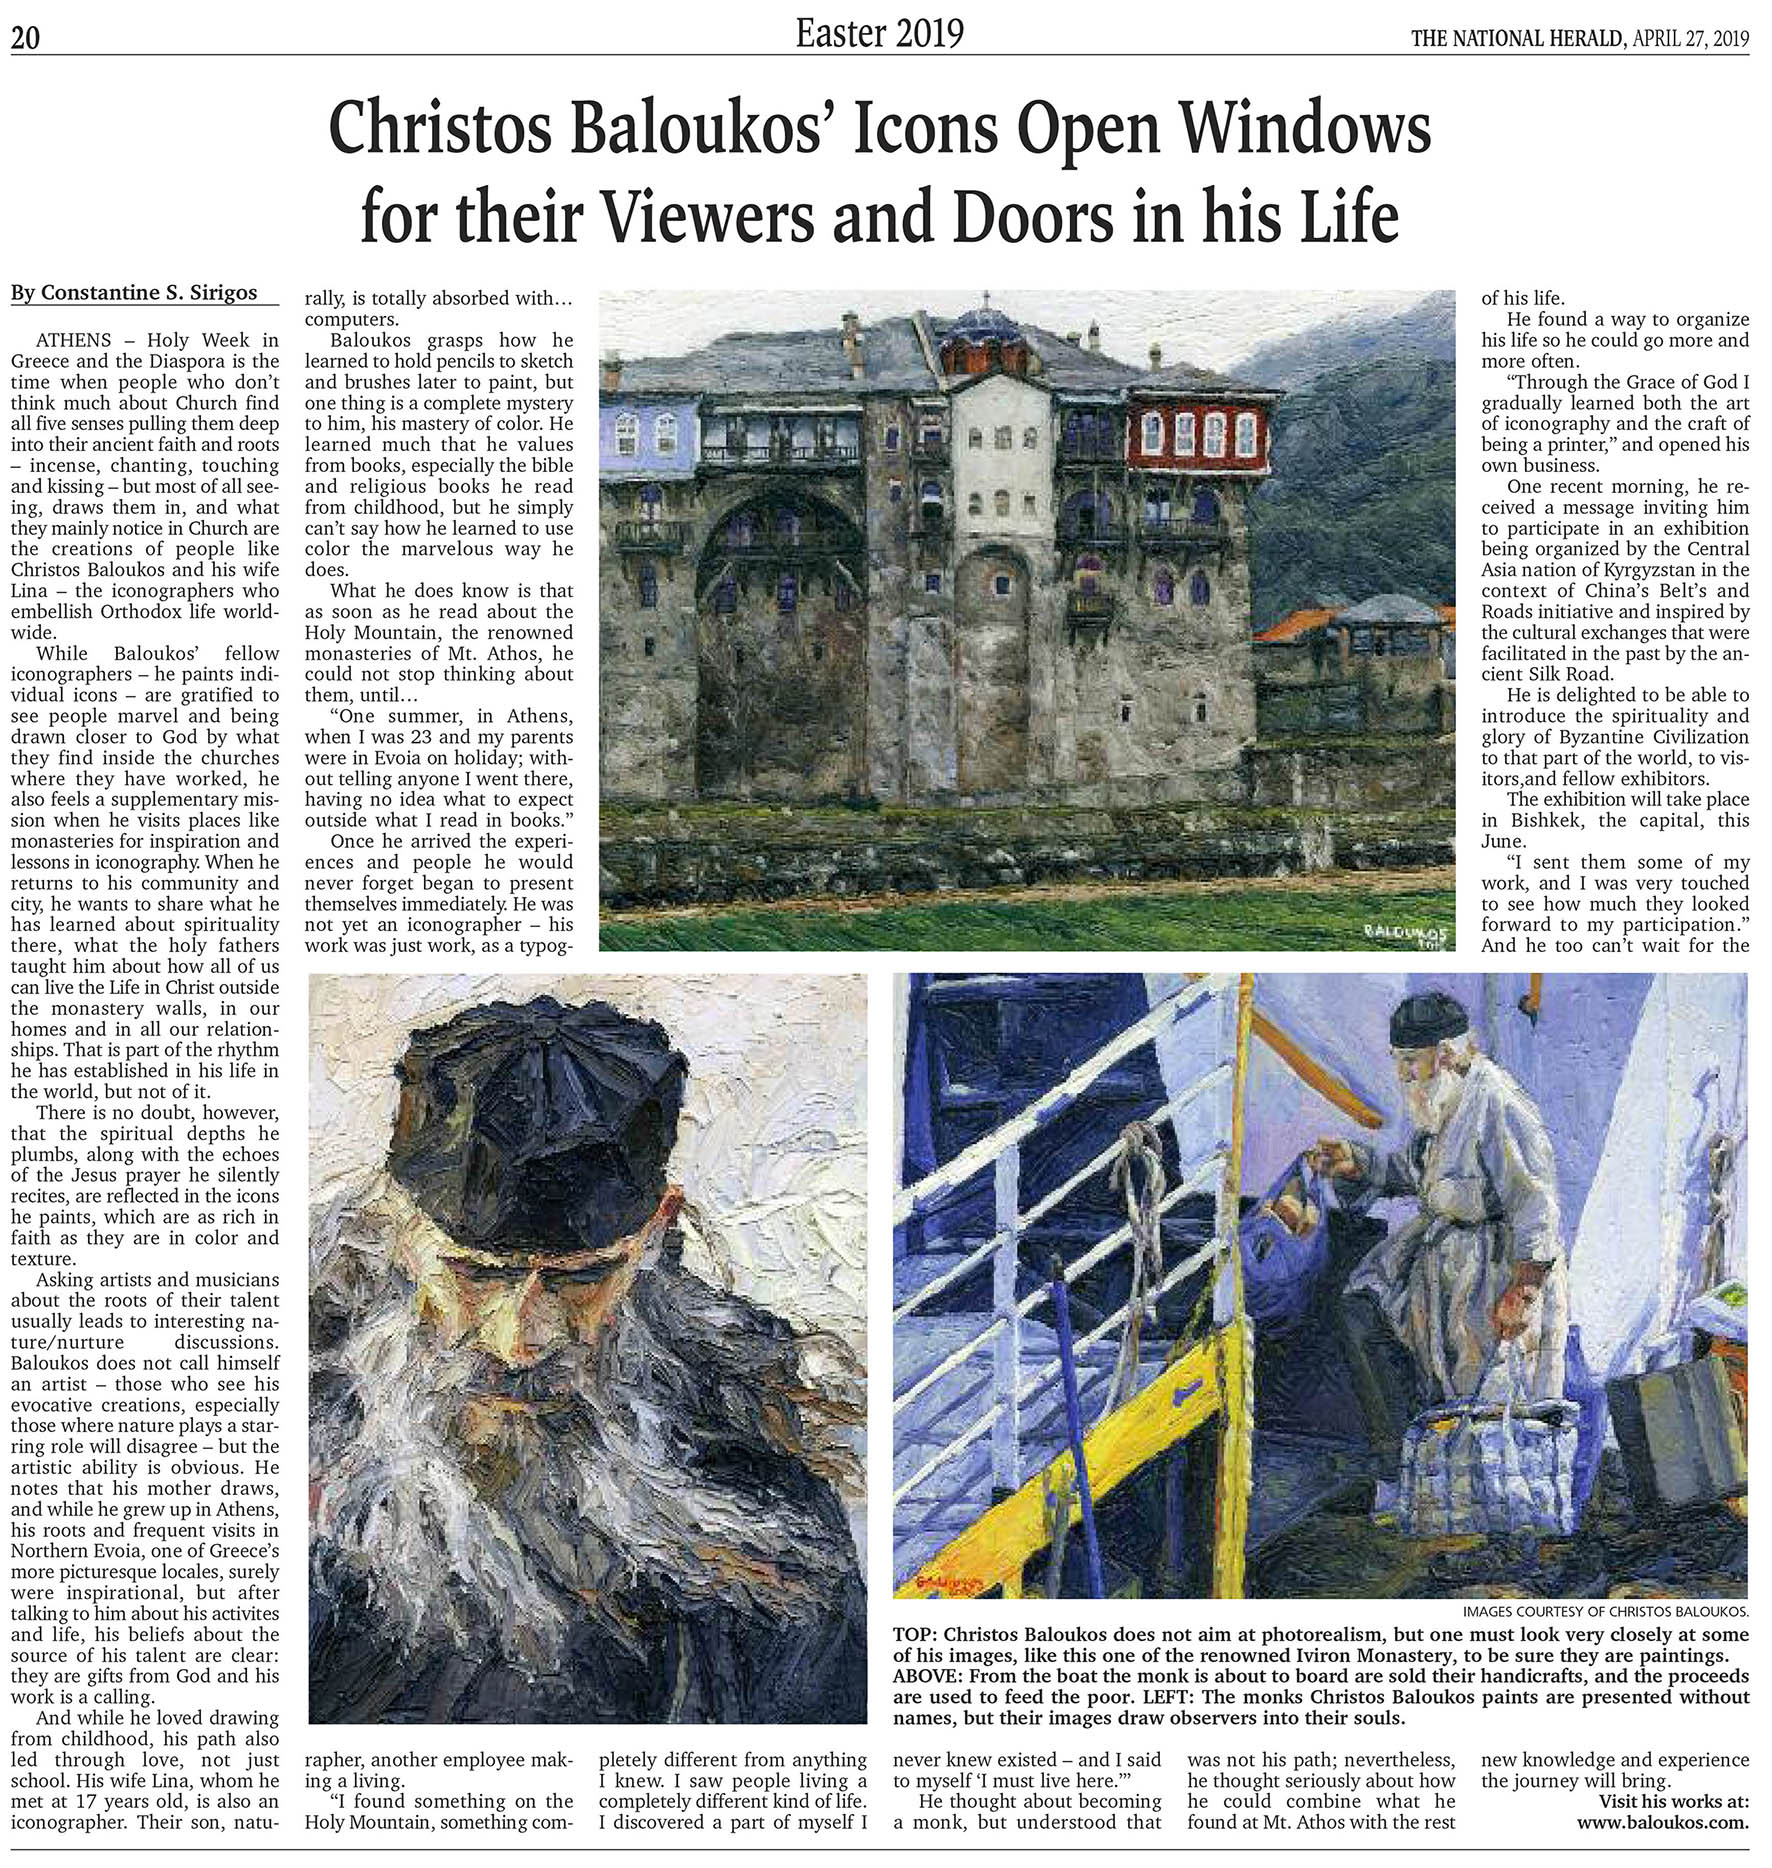 The National Herald - Baloukos